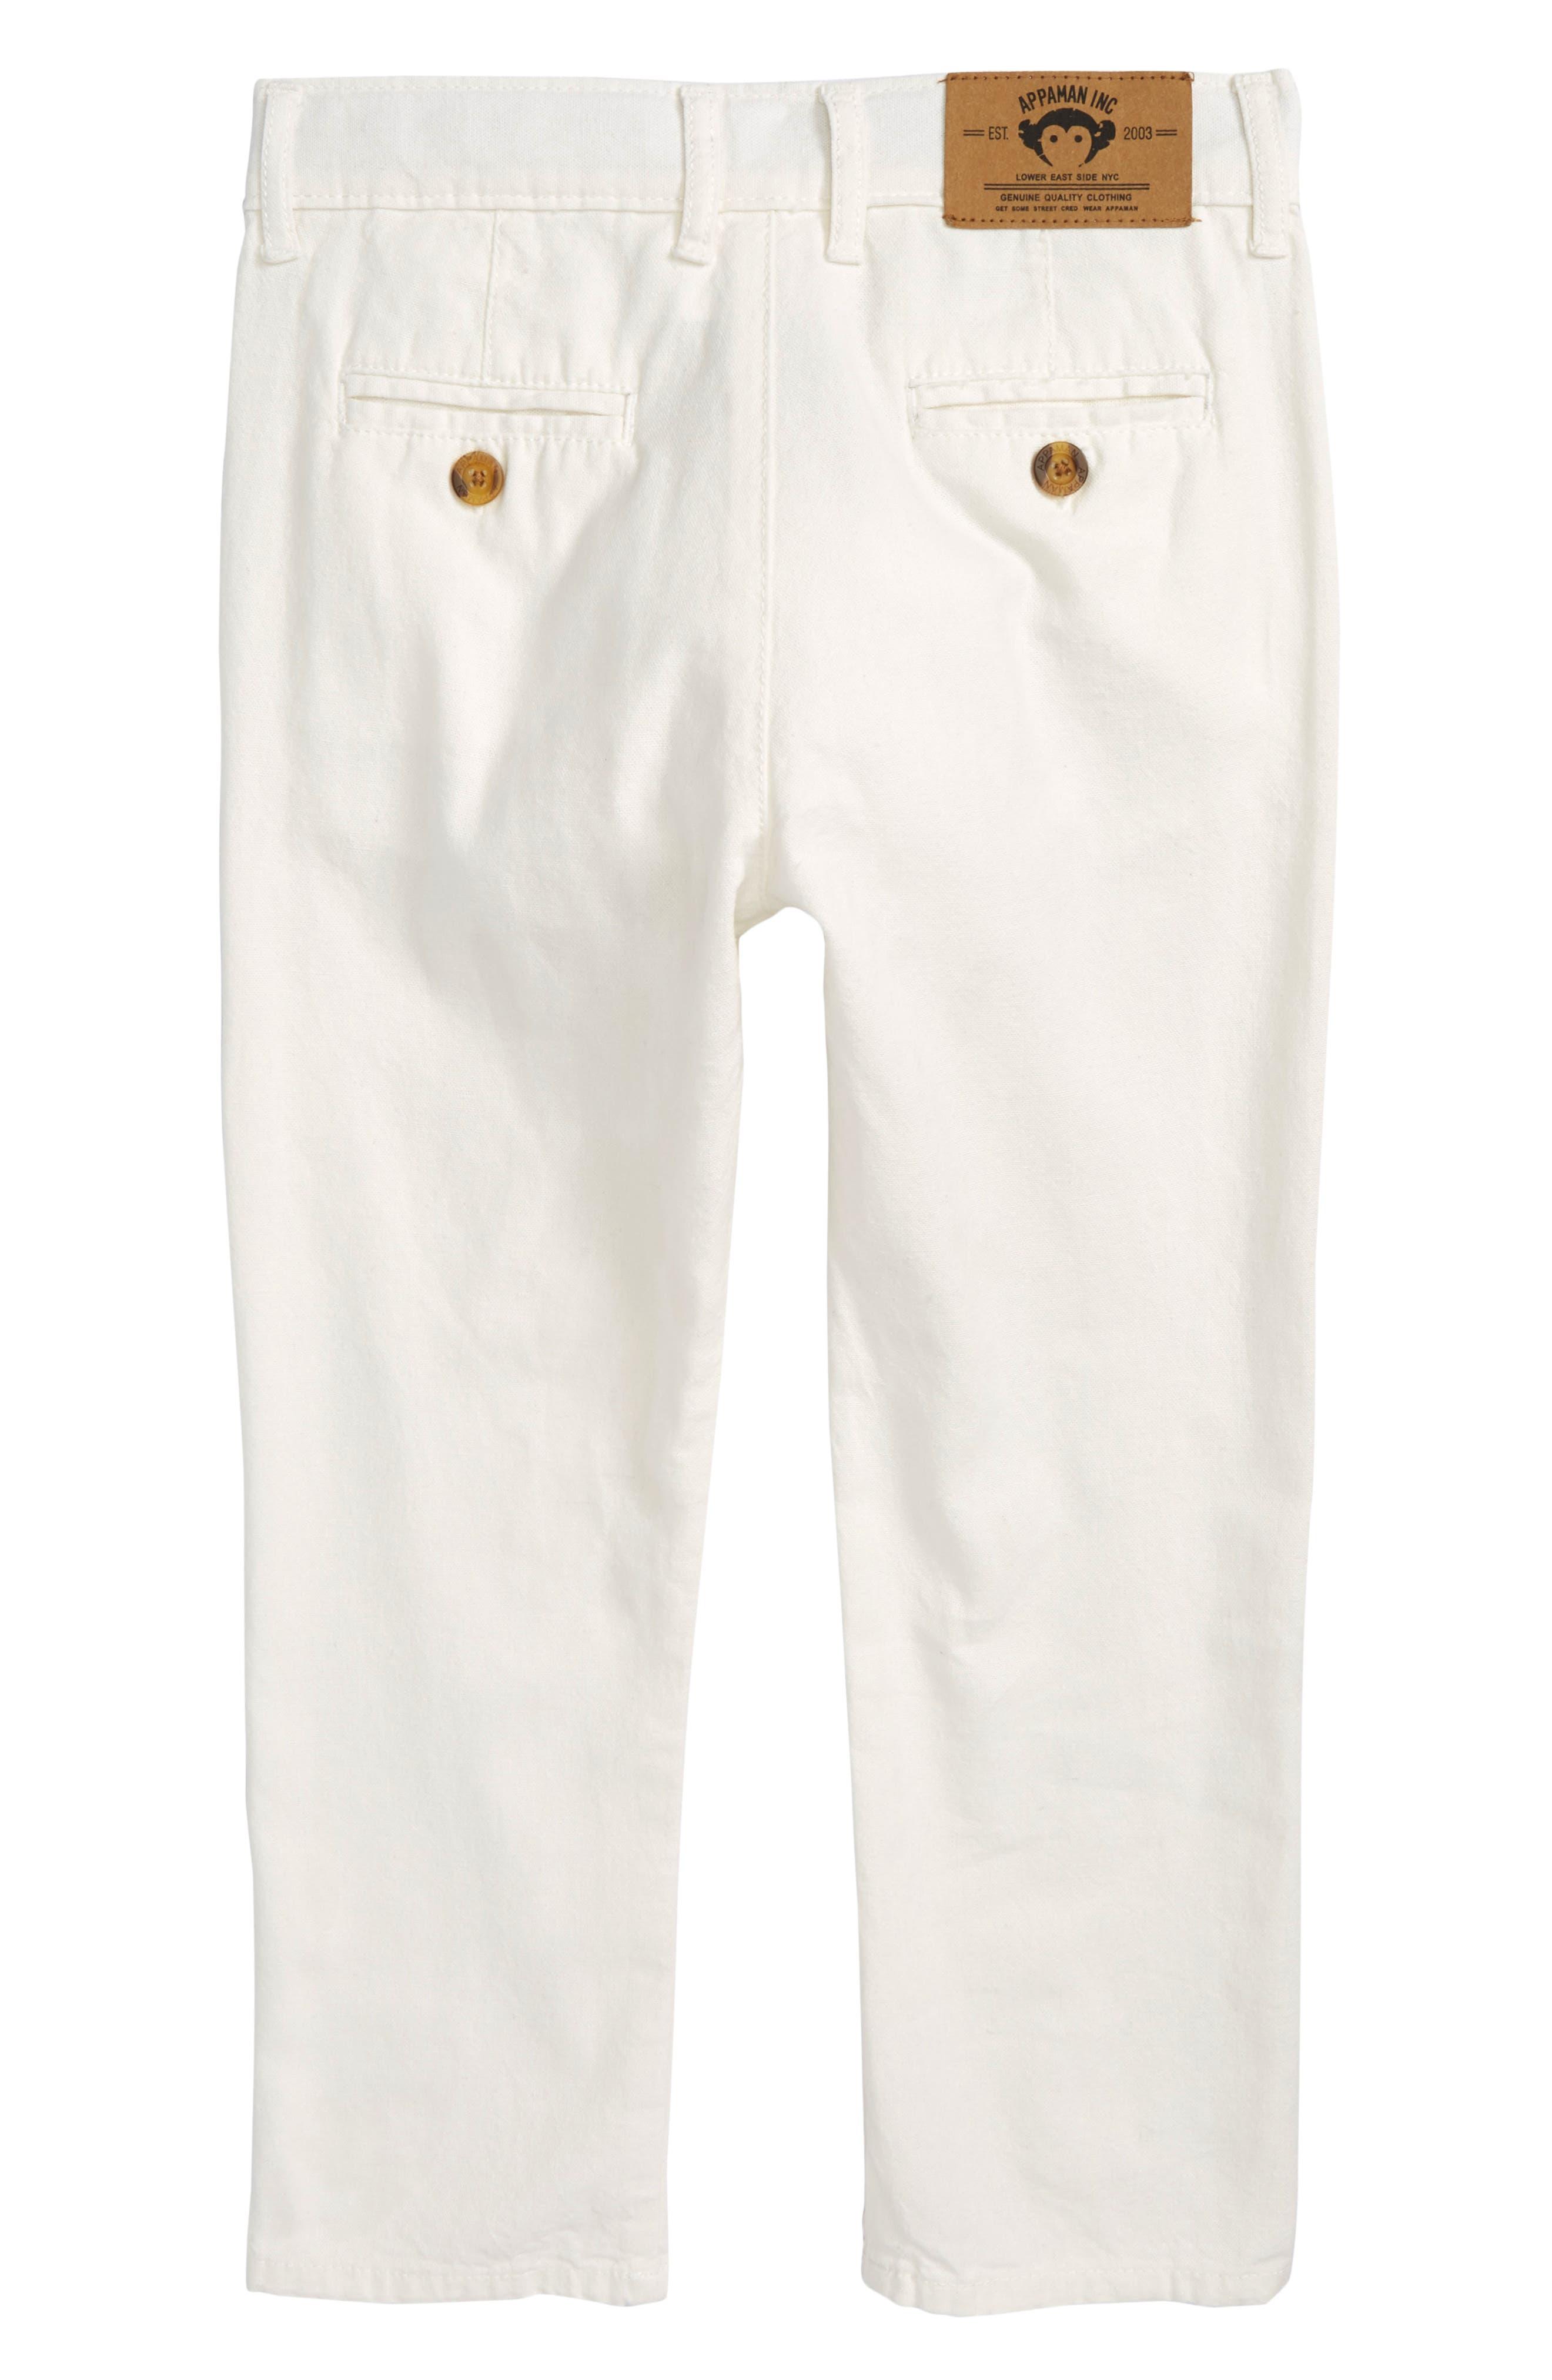 Beach Pants,                             Alternate thumbnail 2, color,                             900